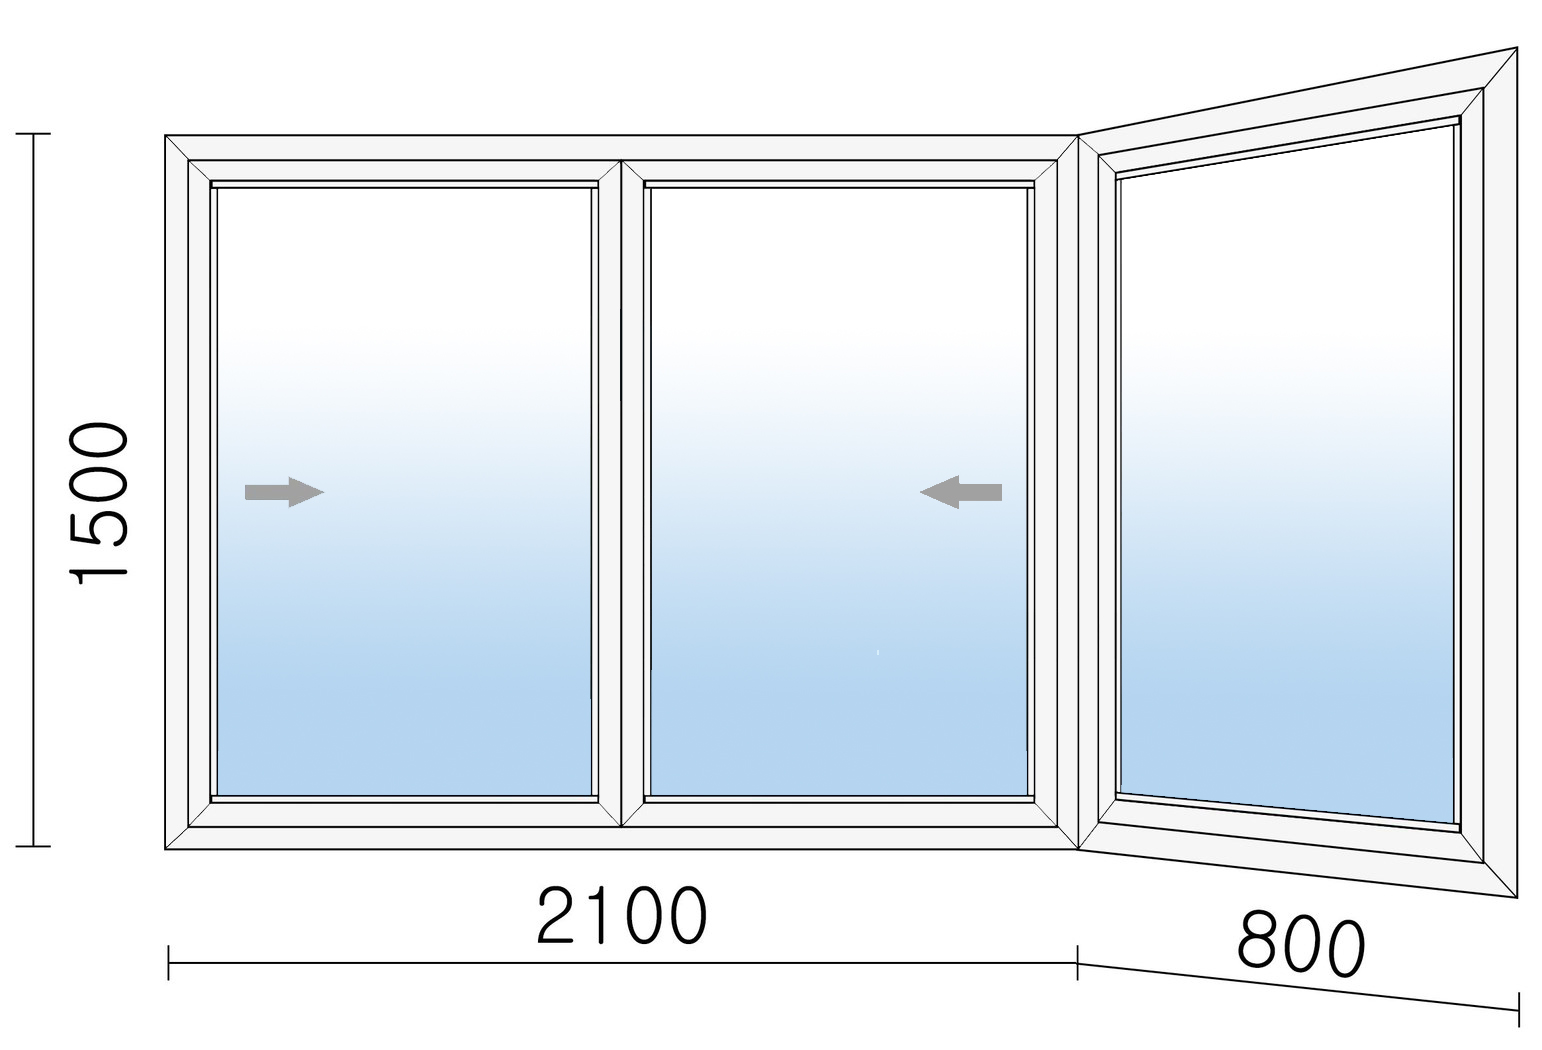 Раздвижное алюминиевое окно 2900х1500